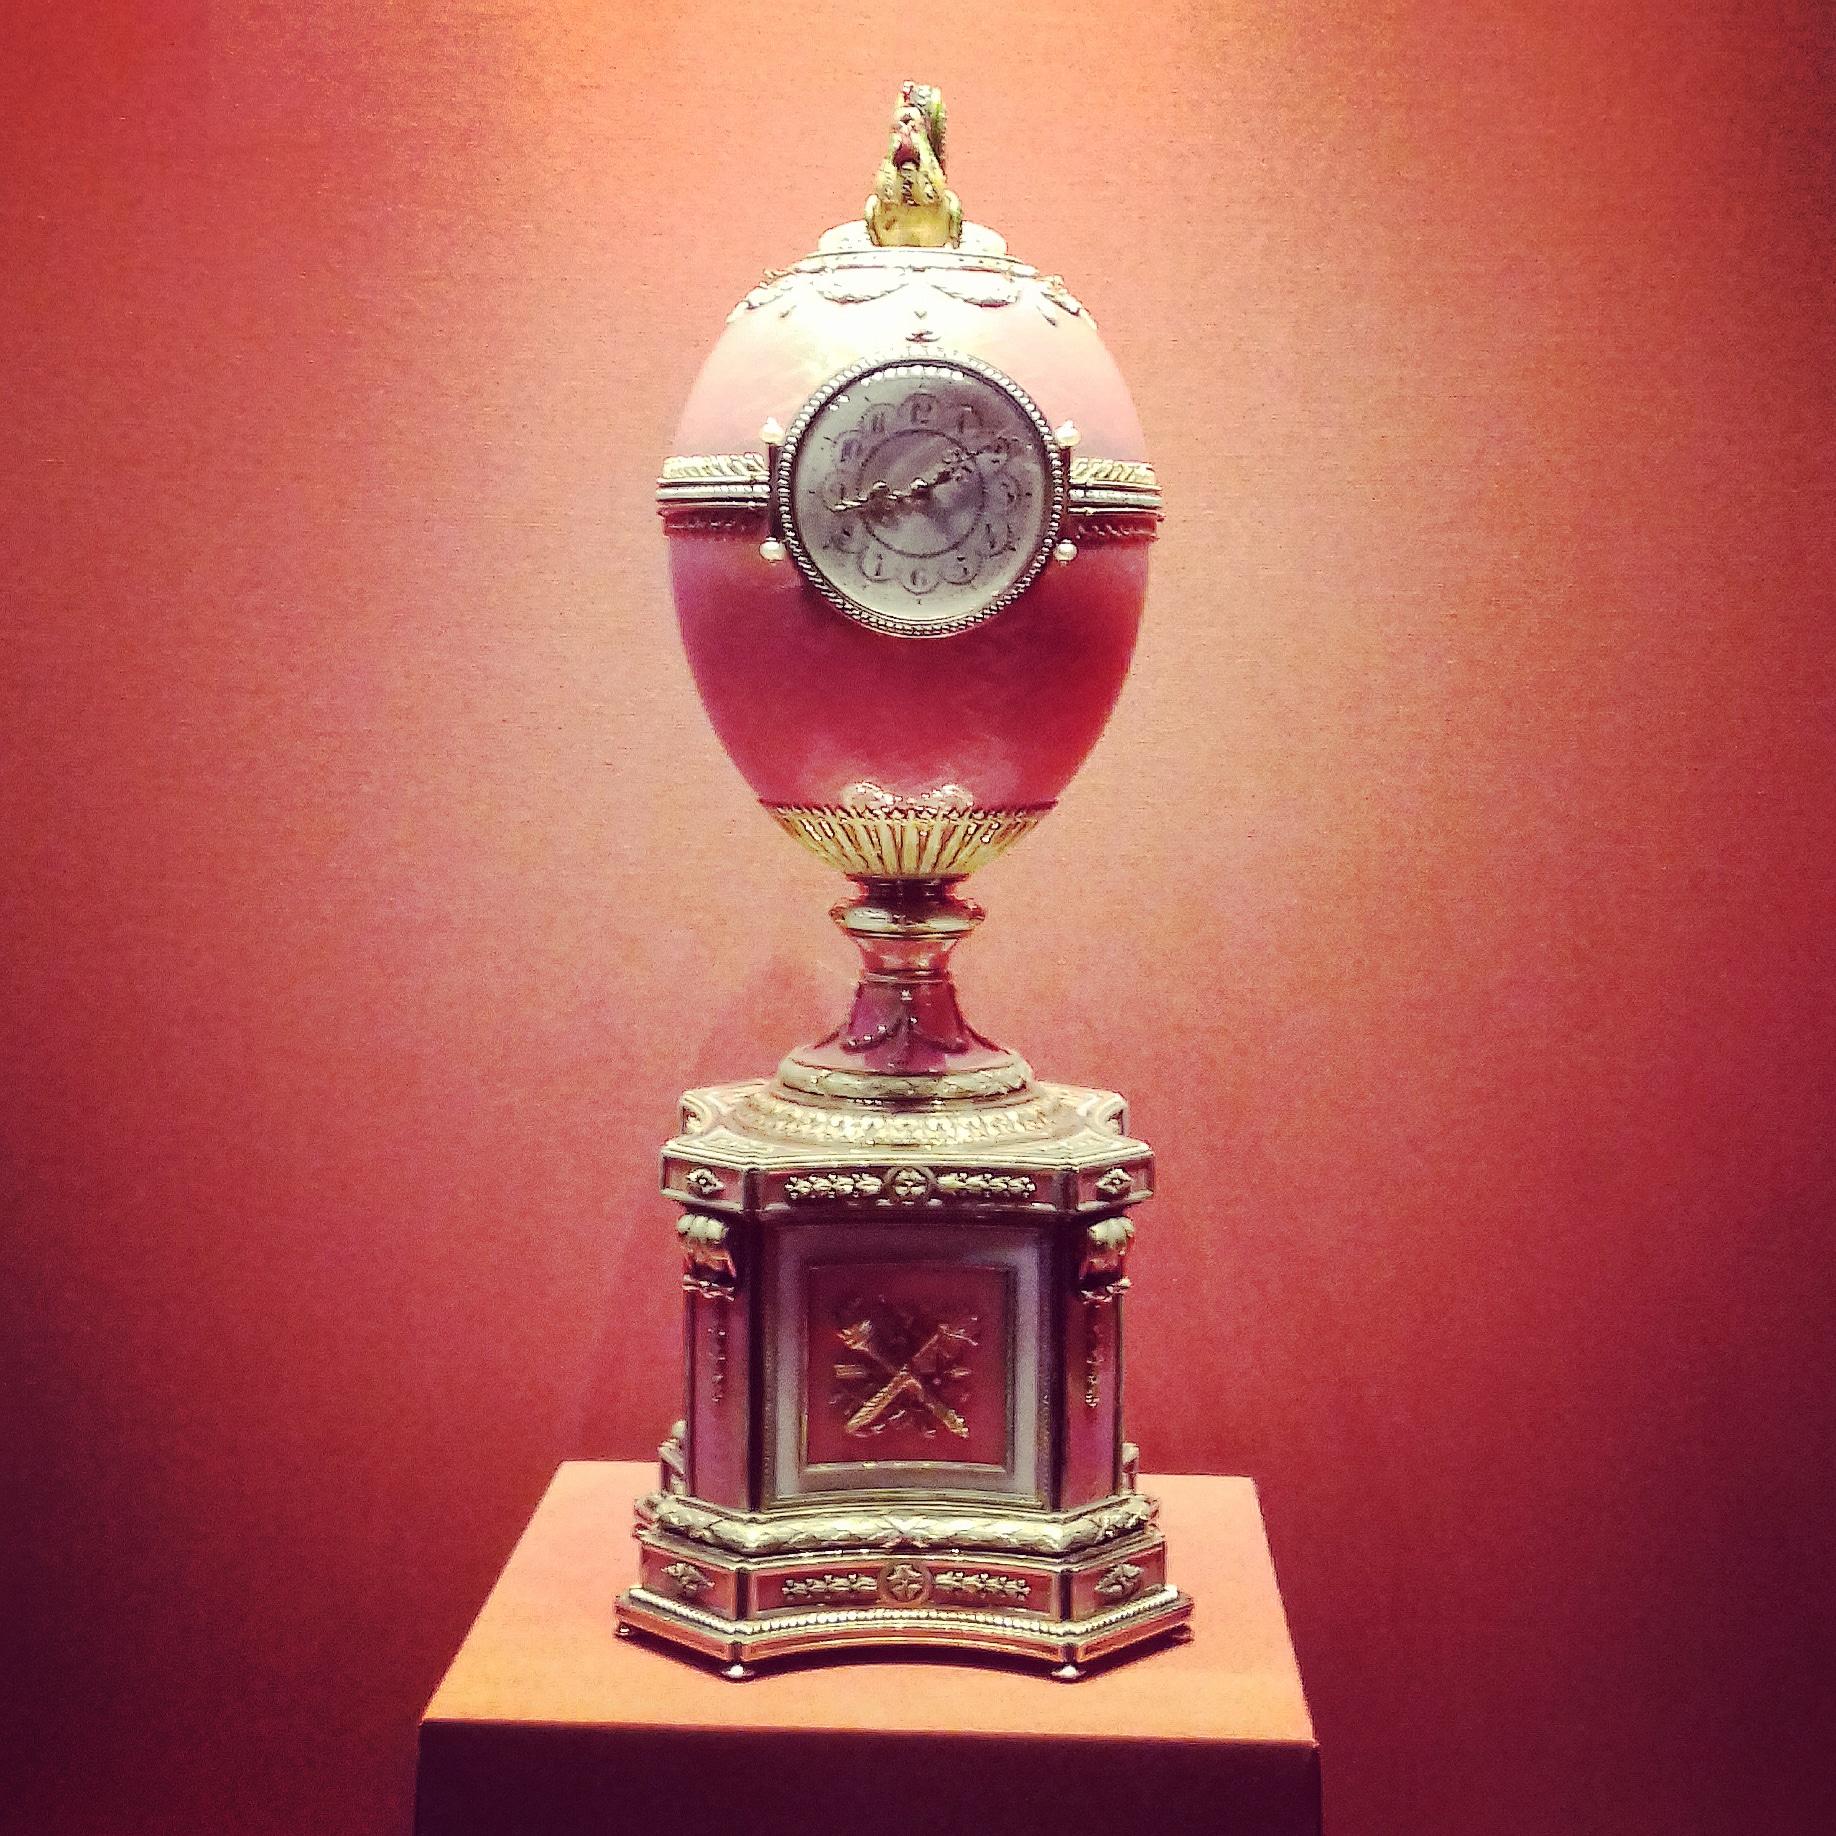 The Rothschild Faberge clock egg, Hermitage Museum, St Petersburg. 2018 © Paola Cacciari